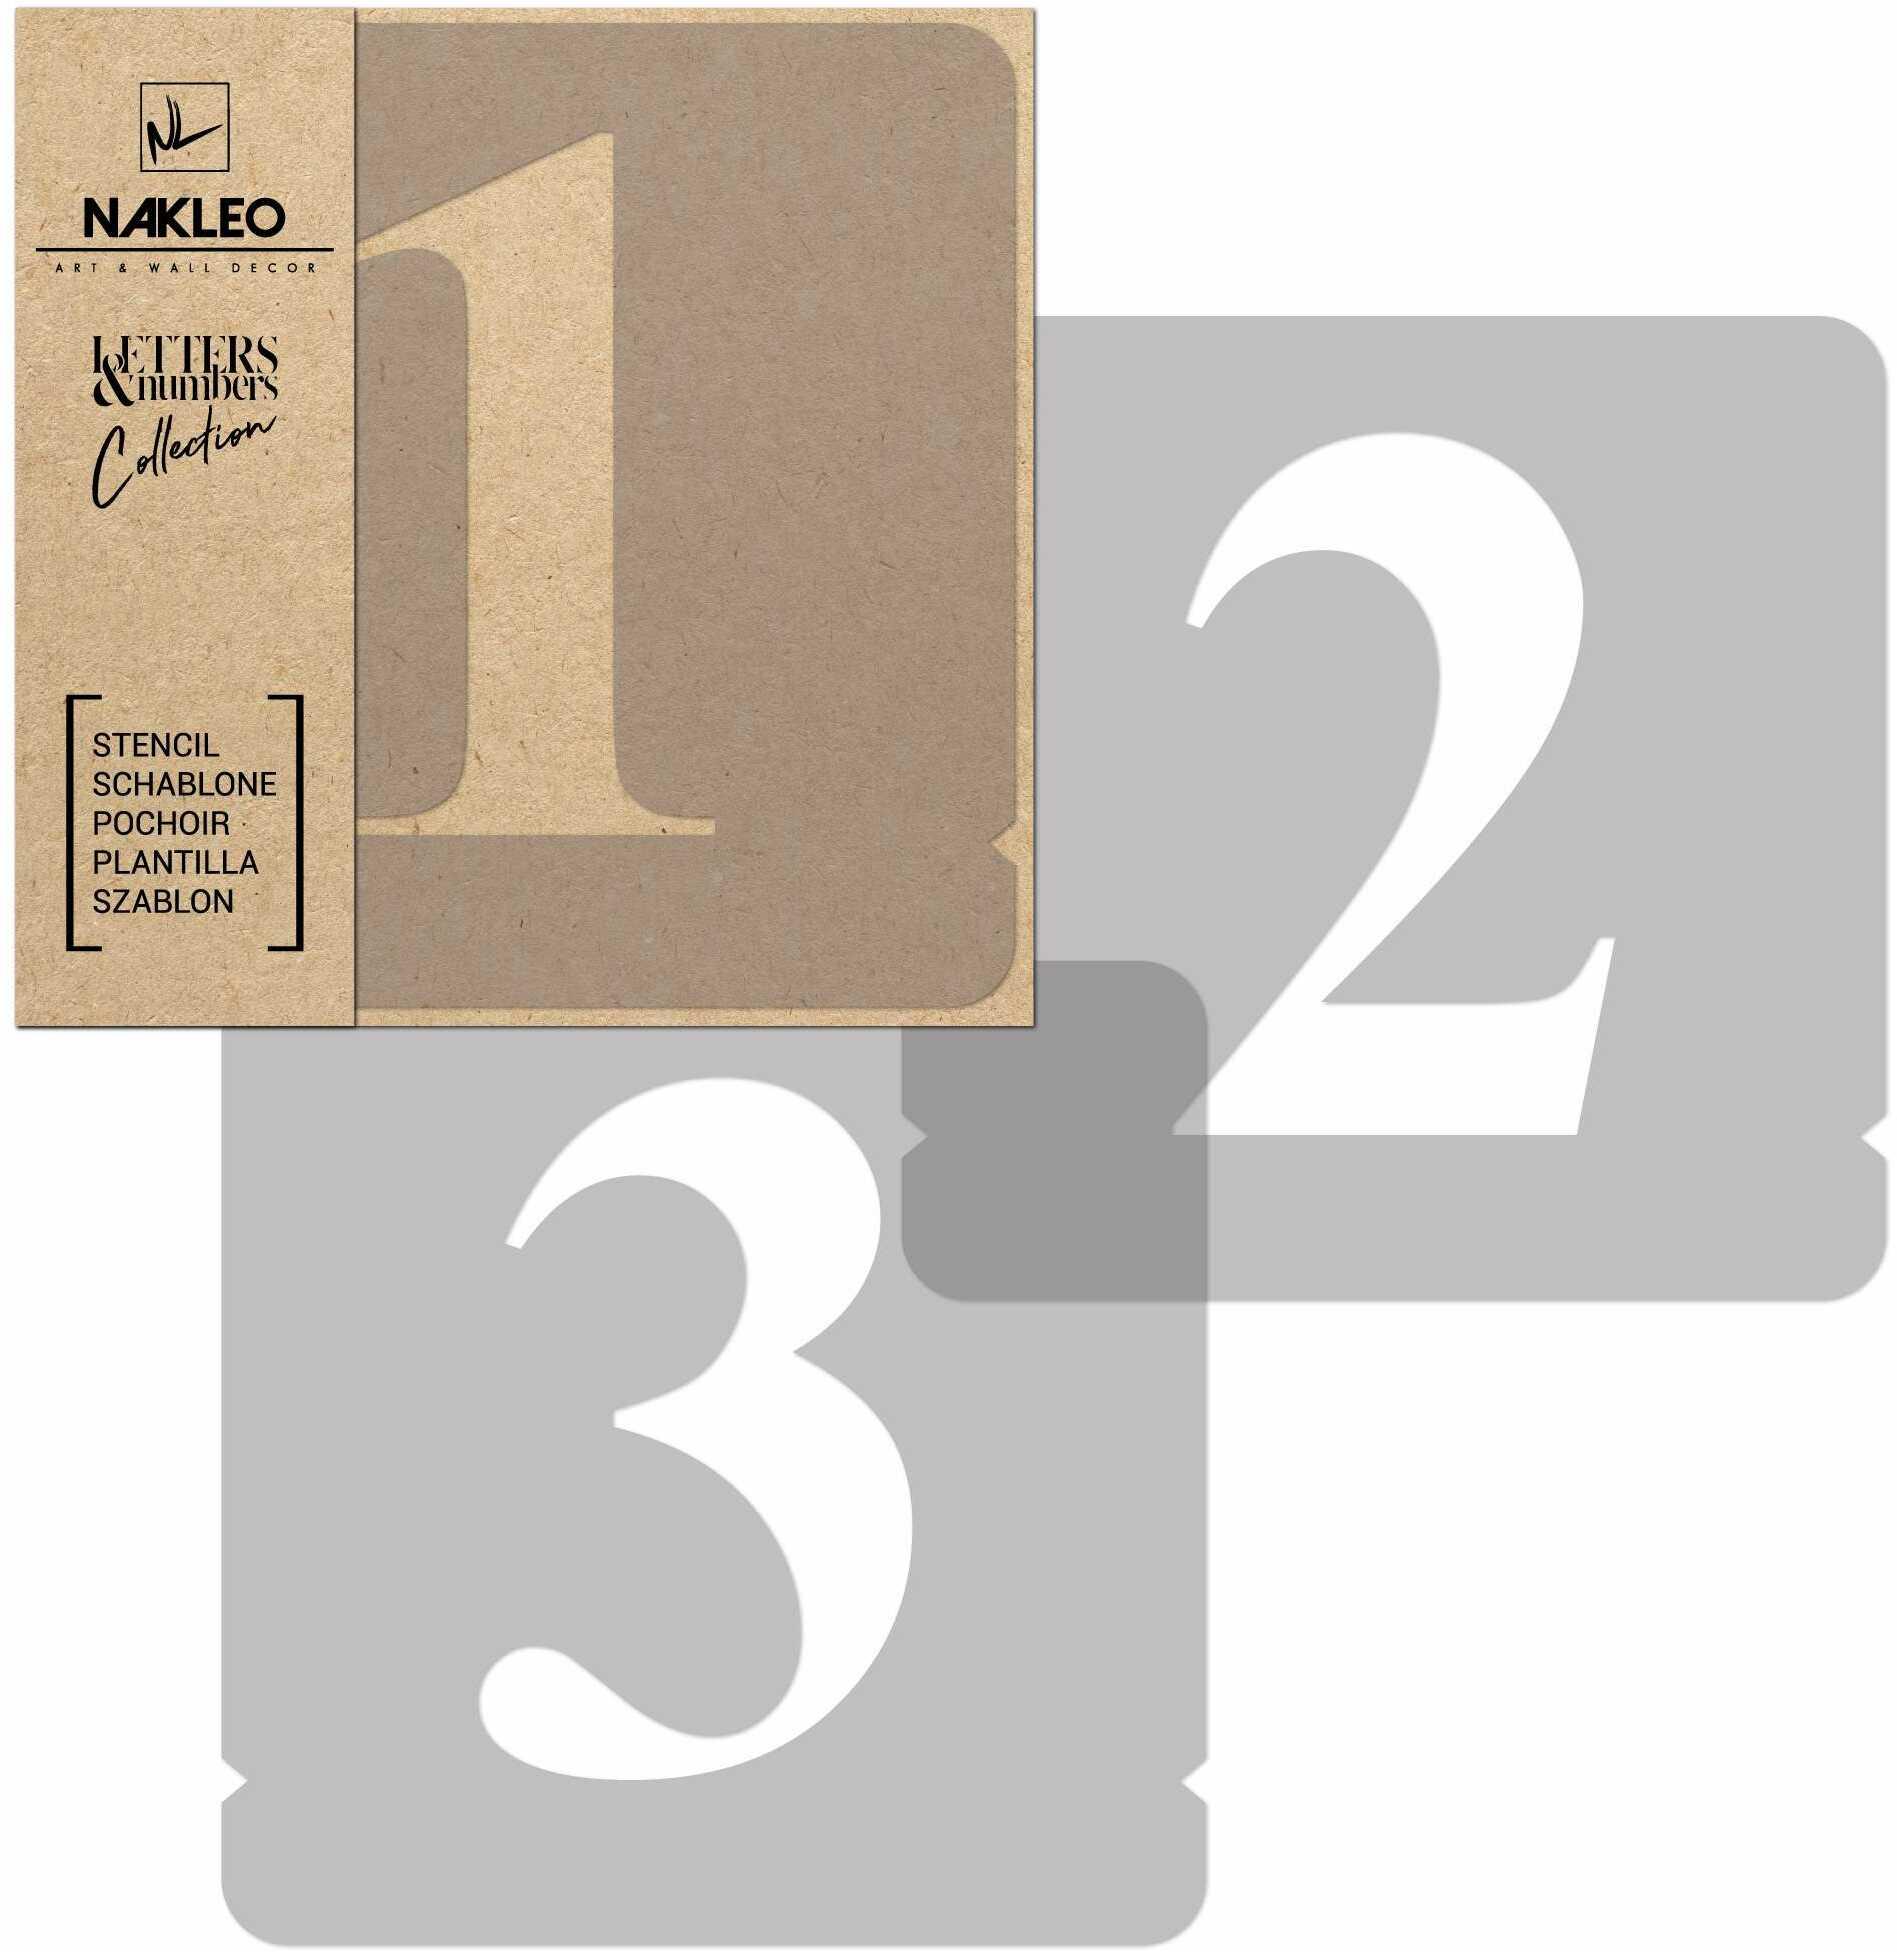 szablon malarski wielokrotny // cyfry 100 mm // Times Roman Cyfry